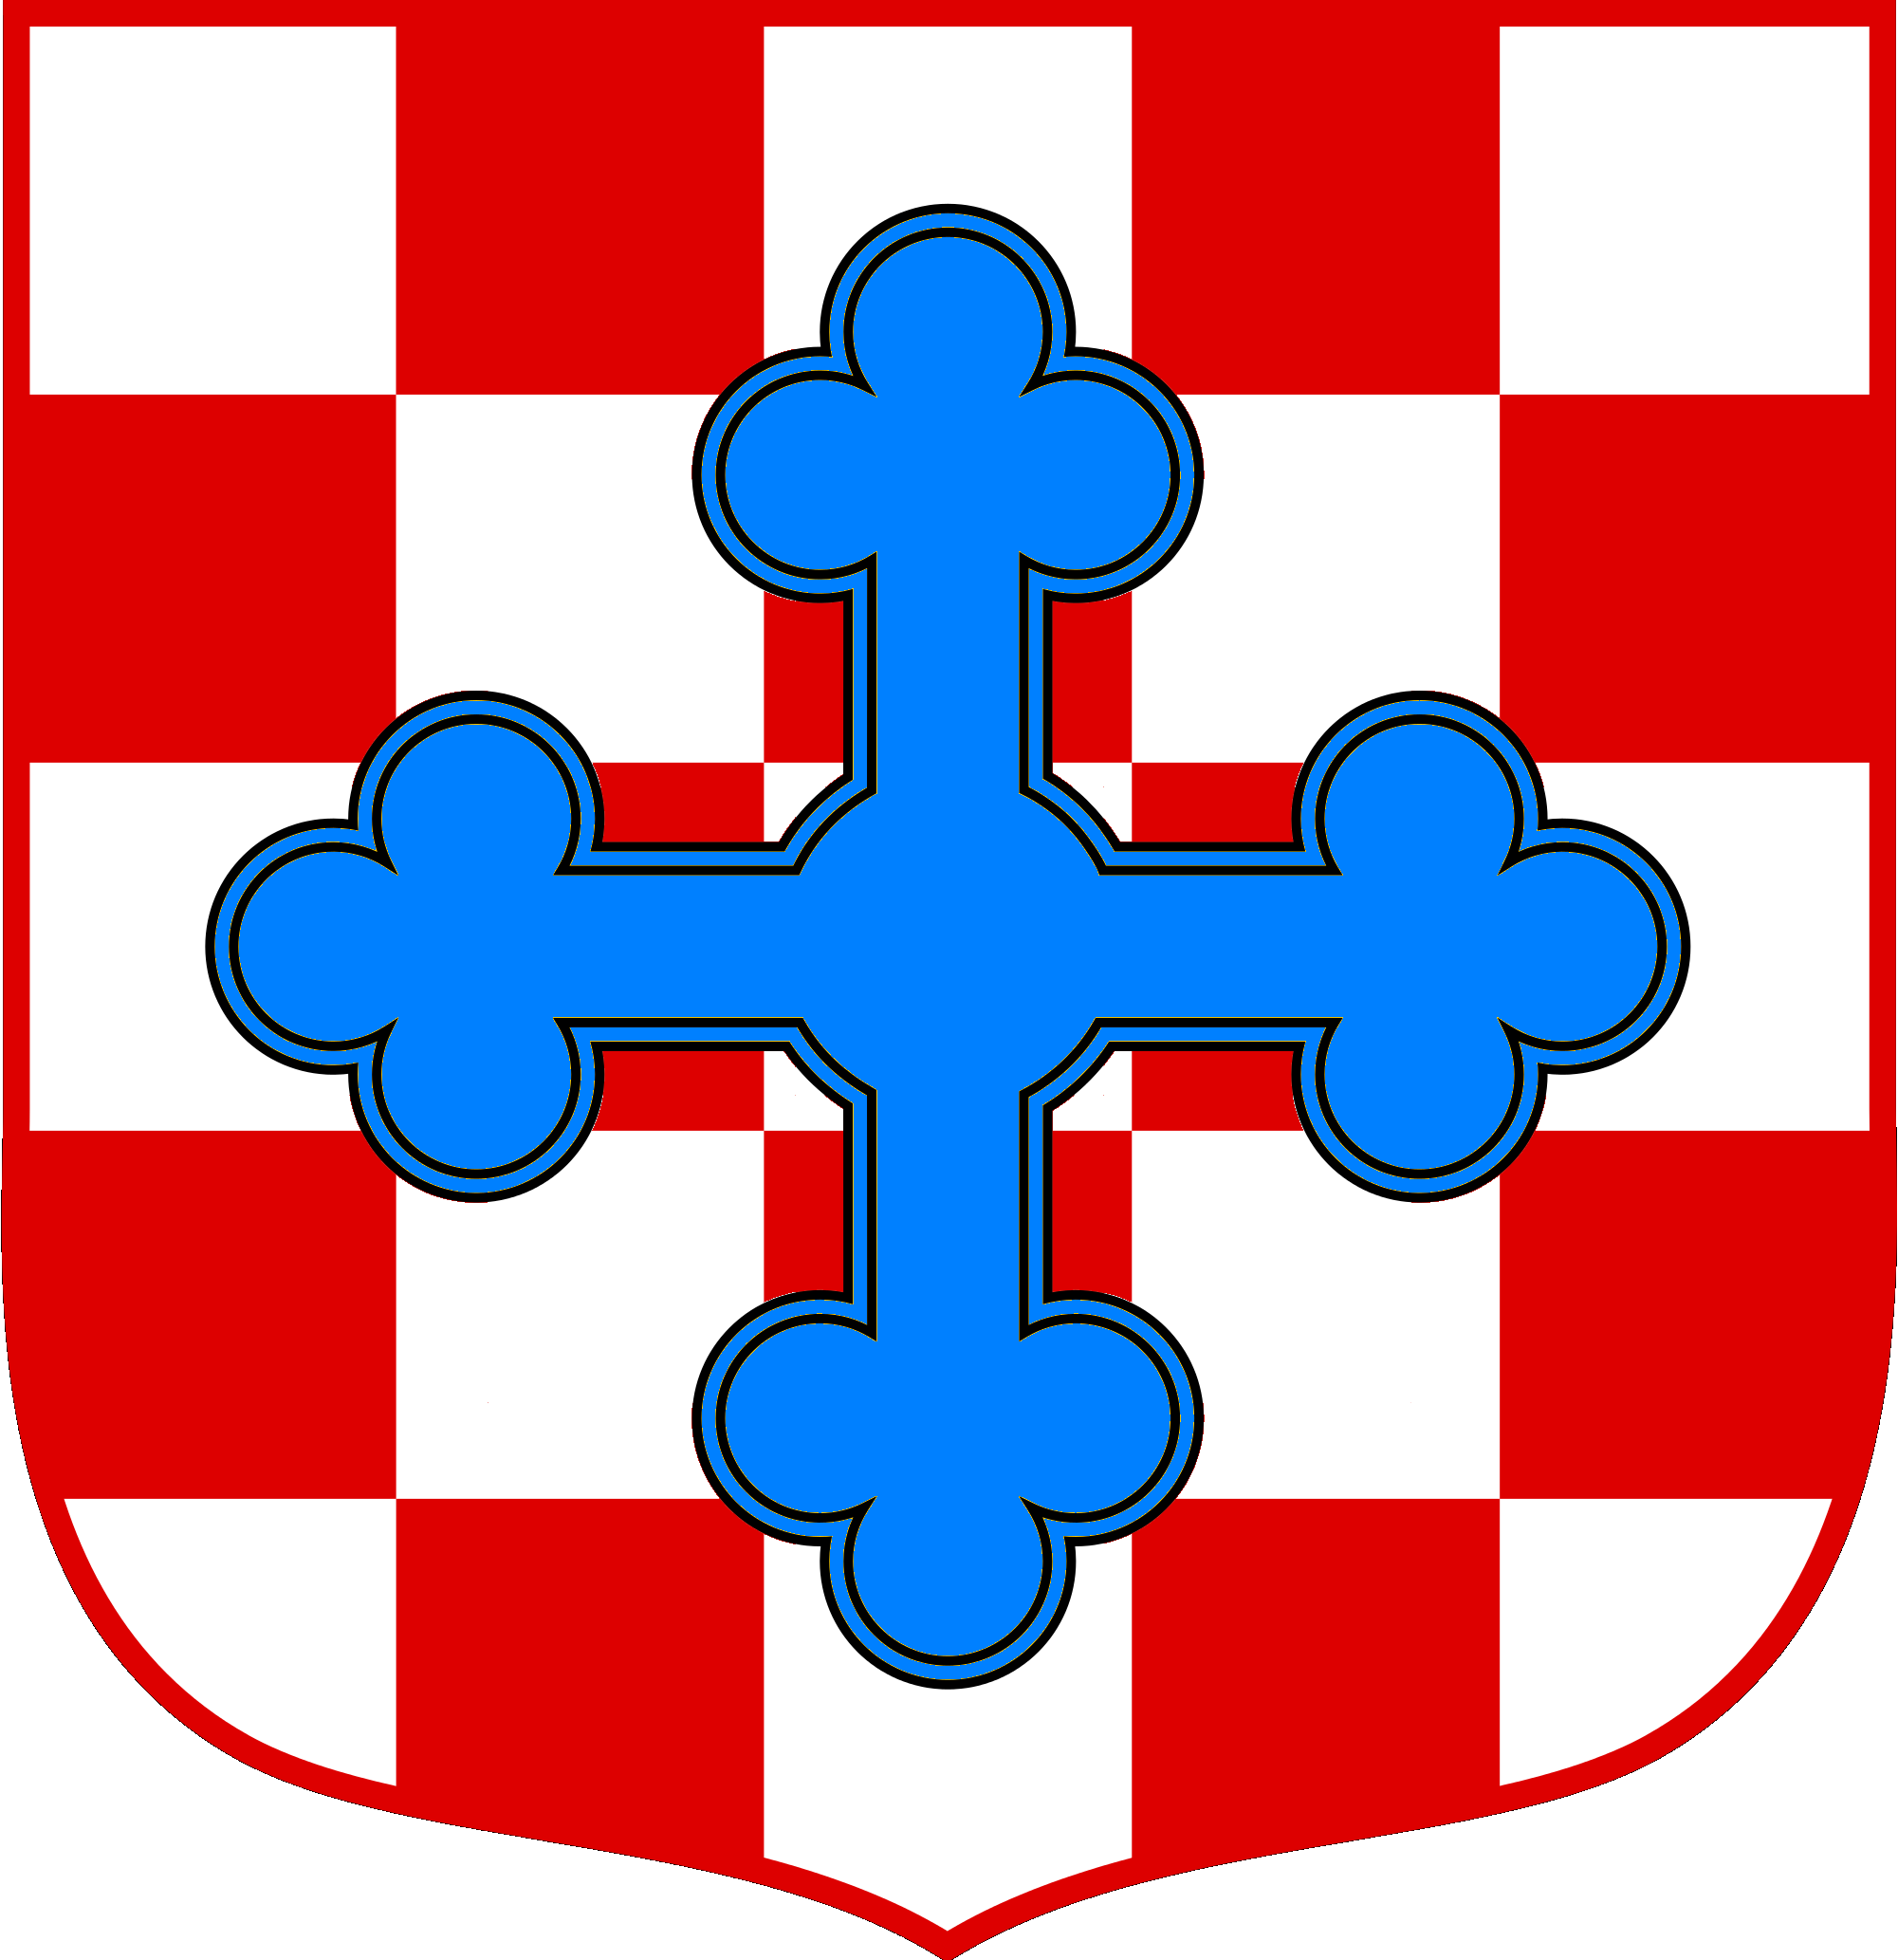 Weihnachten In Kroatien.Kroatisch Orthodoxe Kirche Wikipedia